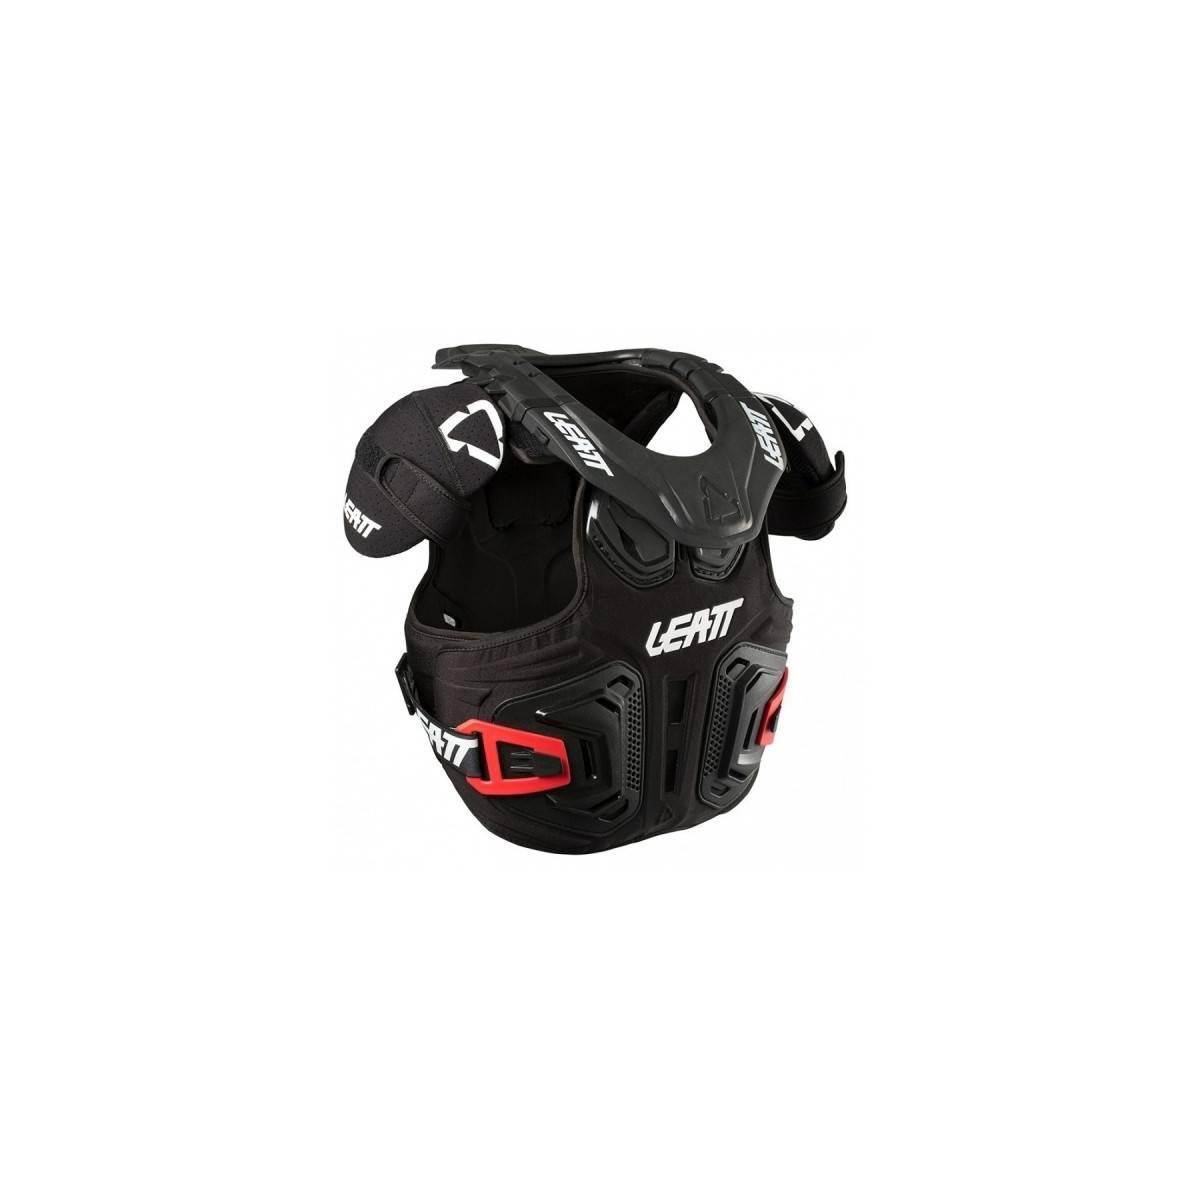 LB101801000 - Peto Y Collarin Fusion 2.0 Junior Leatt Brace Negro